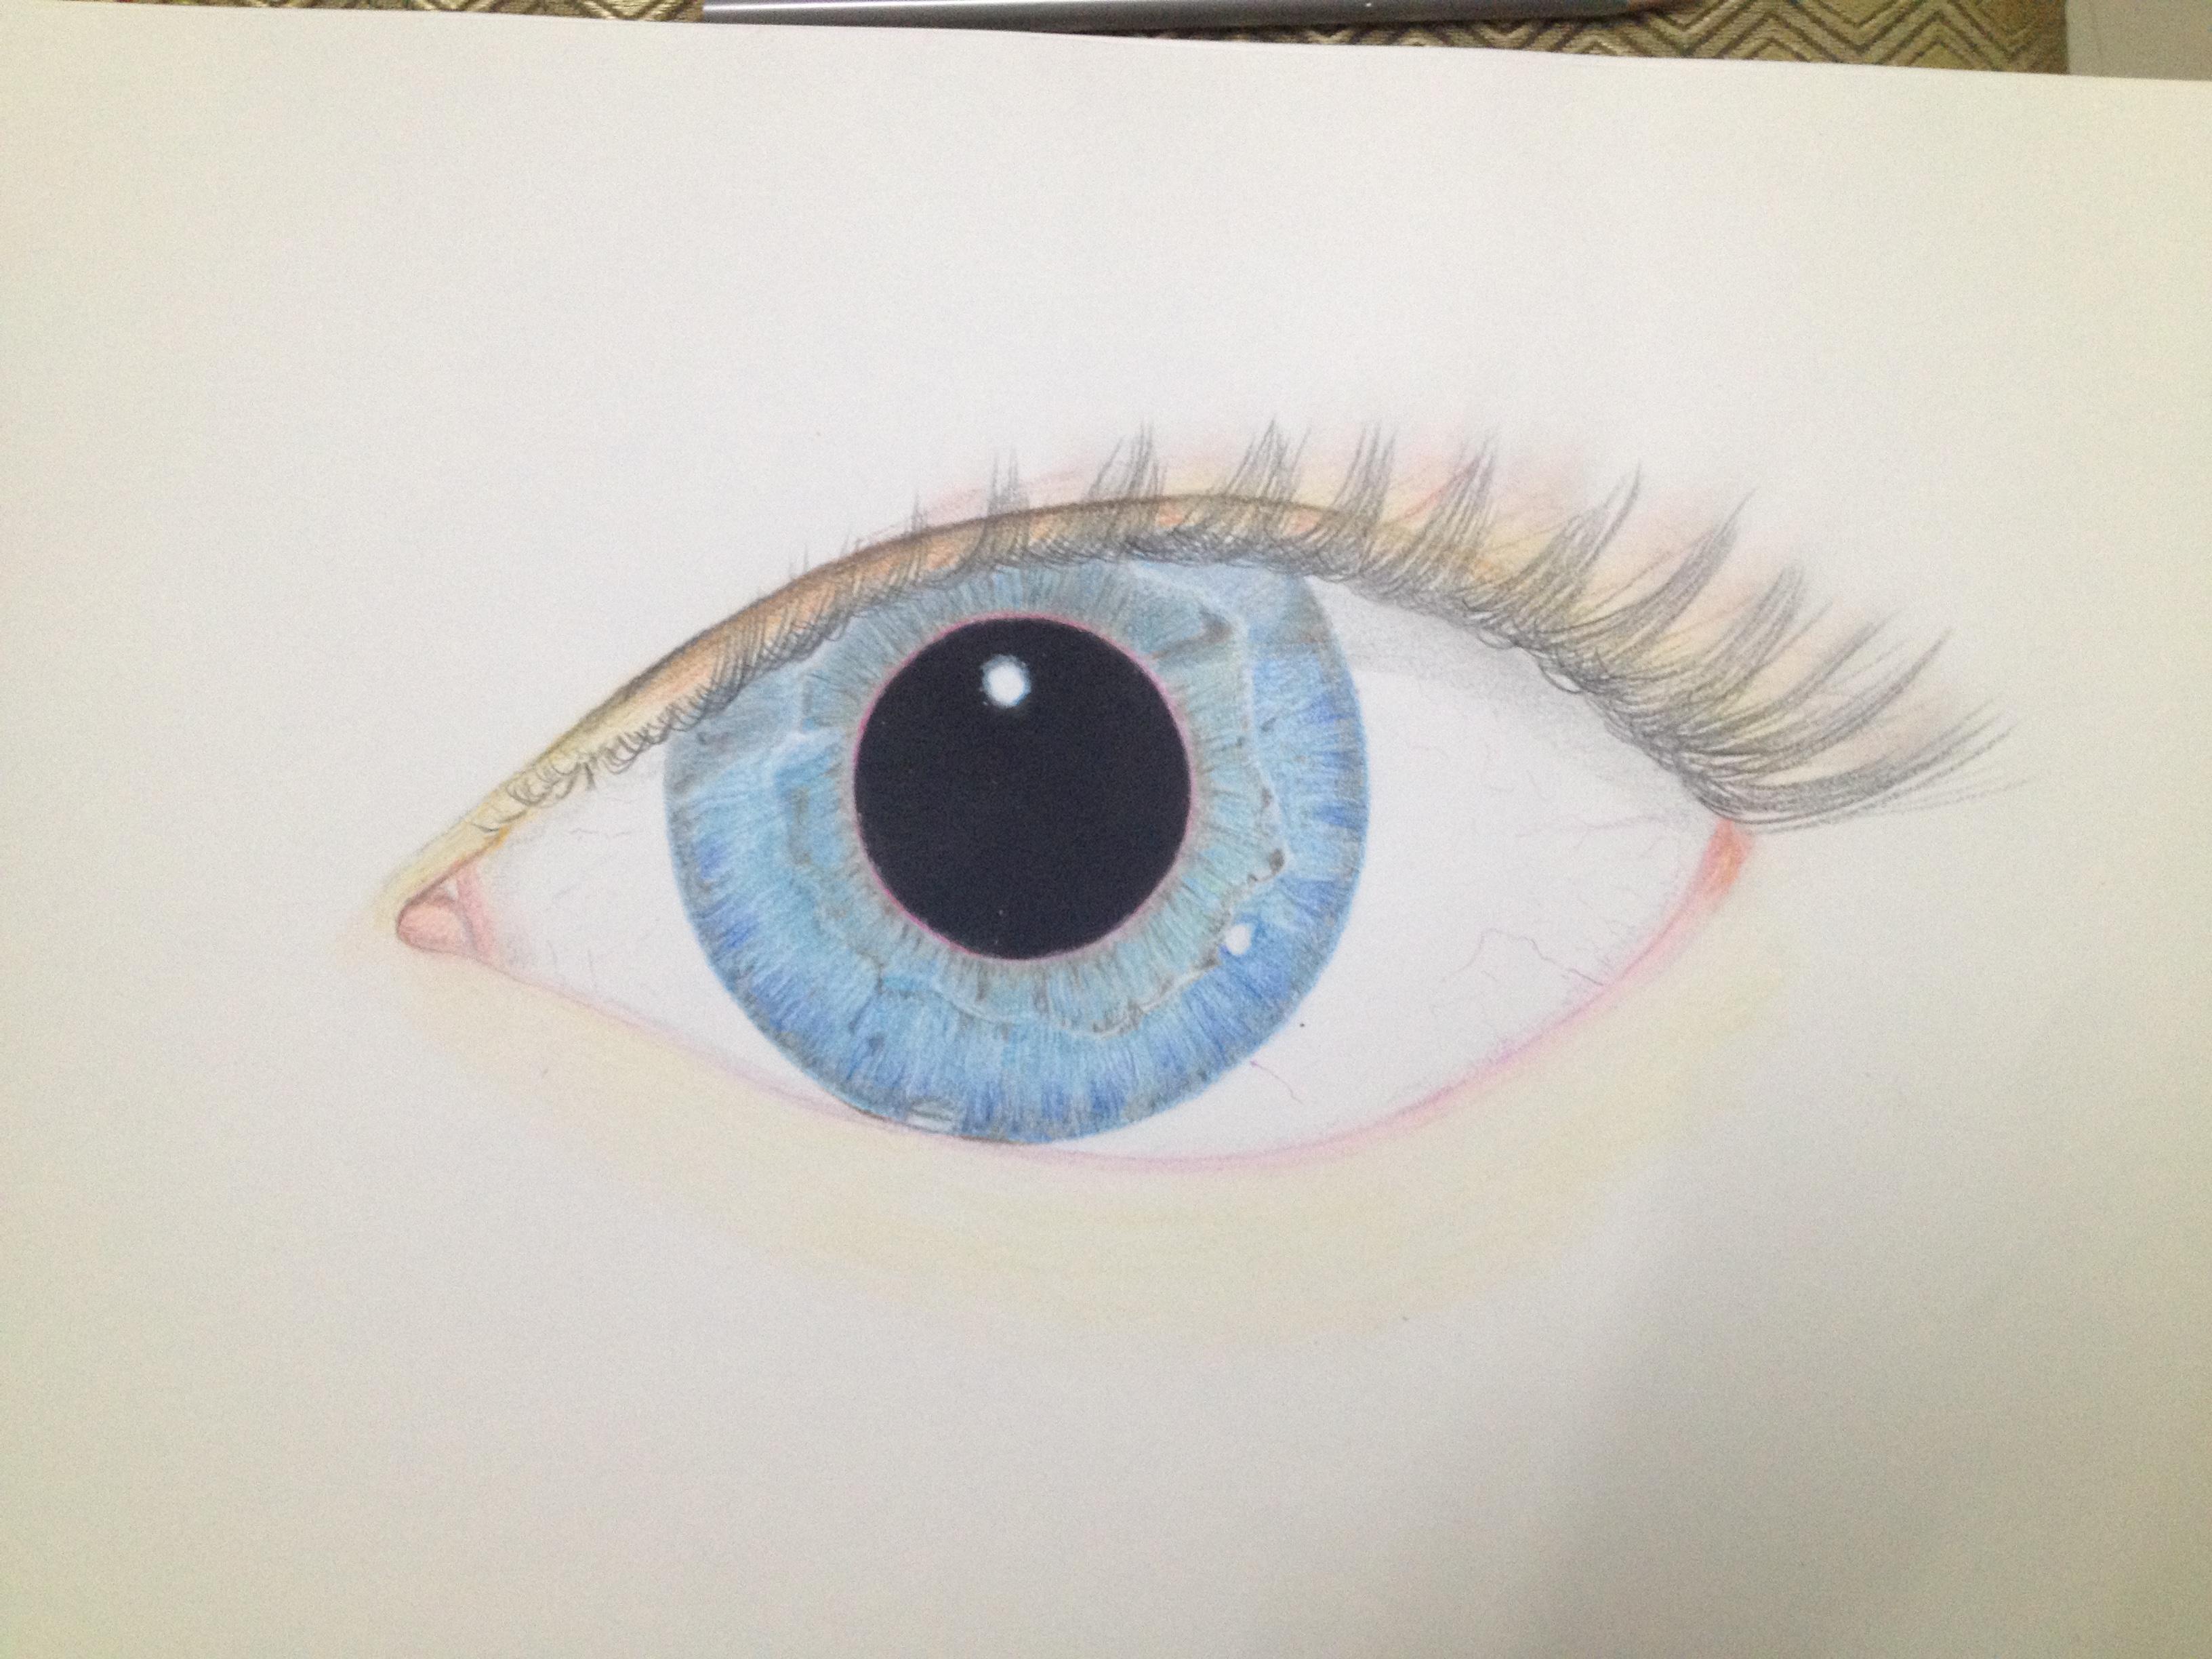 3264x2448 Draw An Eye Penpencilandstories (By Mita Jain)